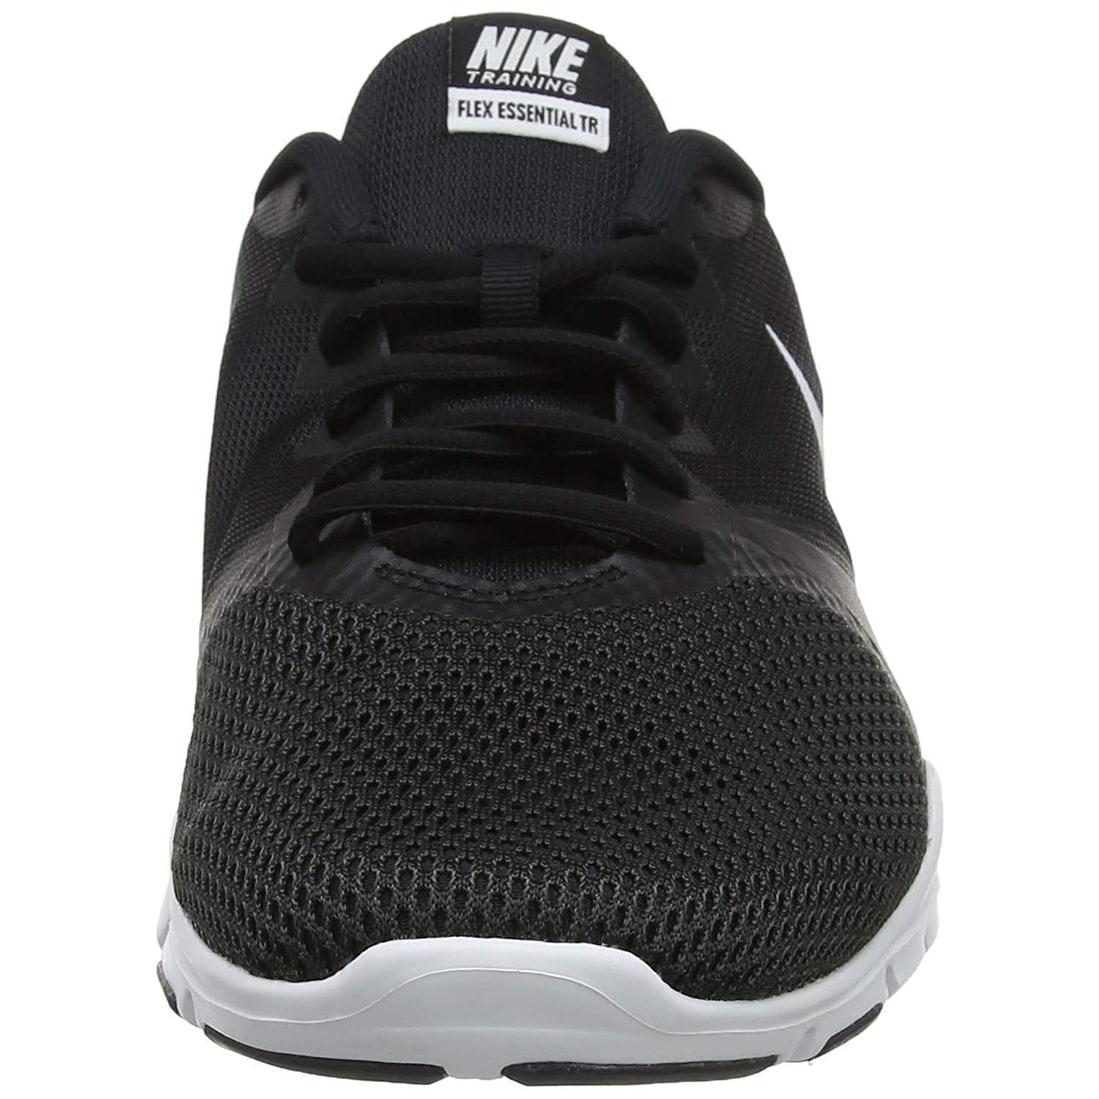 0d2aebbcf2964 Shop Nike Women s Flex Essential Training Shoe (8.5